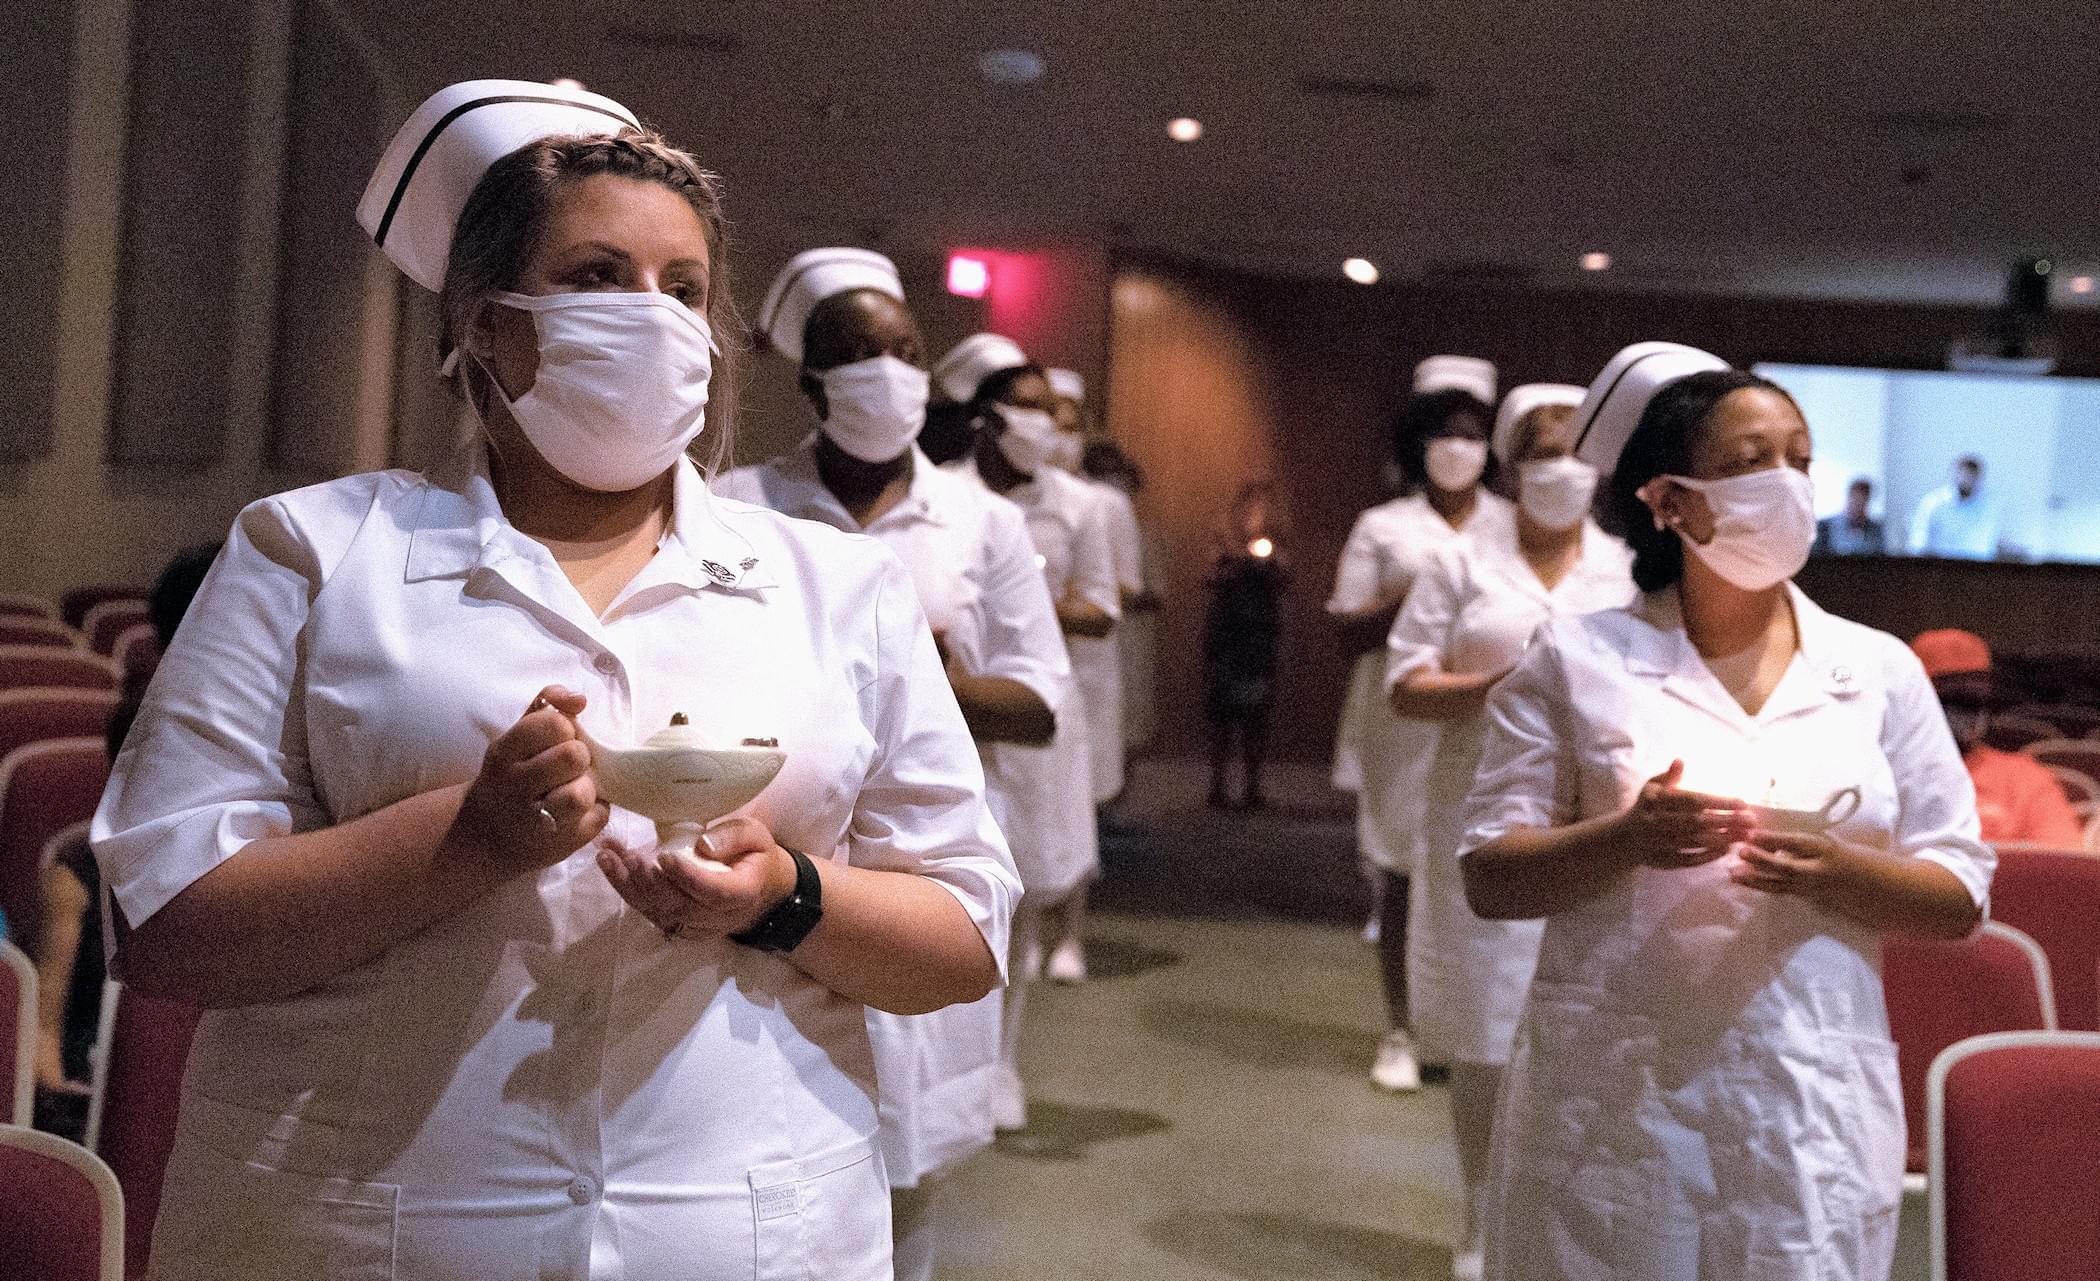 WCC Nursing Program Earns Top Ranking